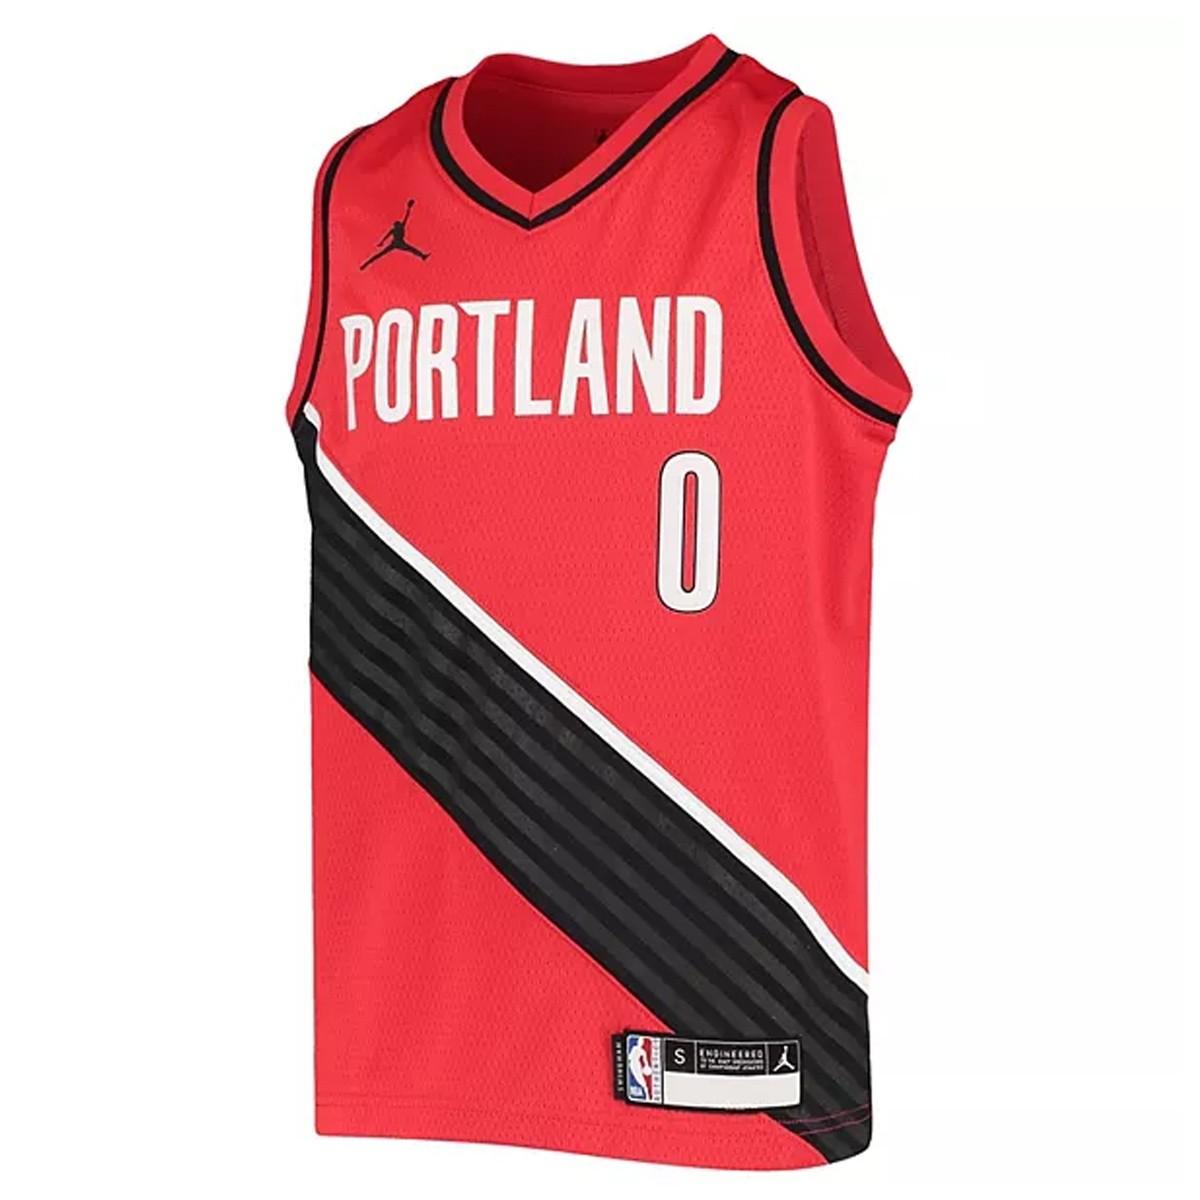 Jordan Jr NBA Blazers Swingman Jersey Damian Lillard 'Statement Edition'